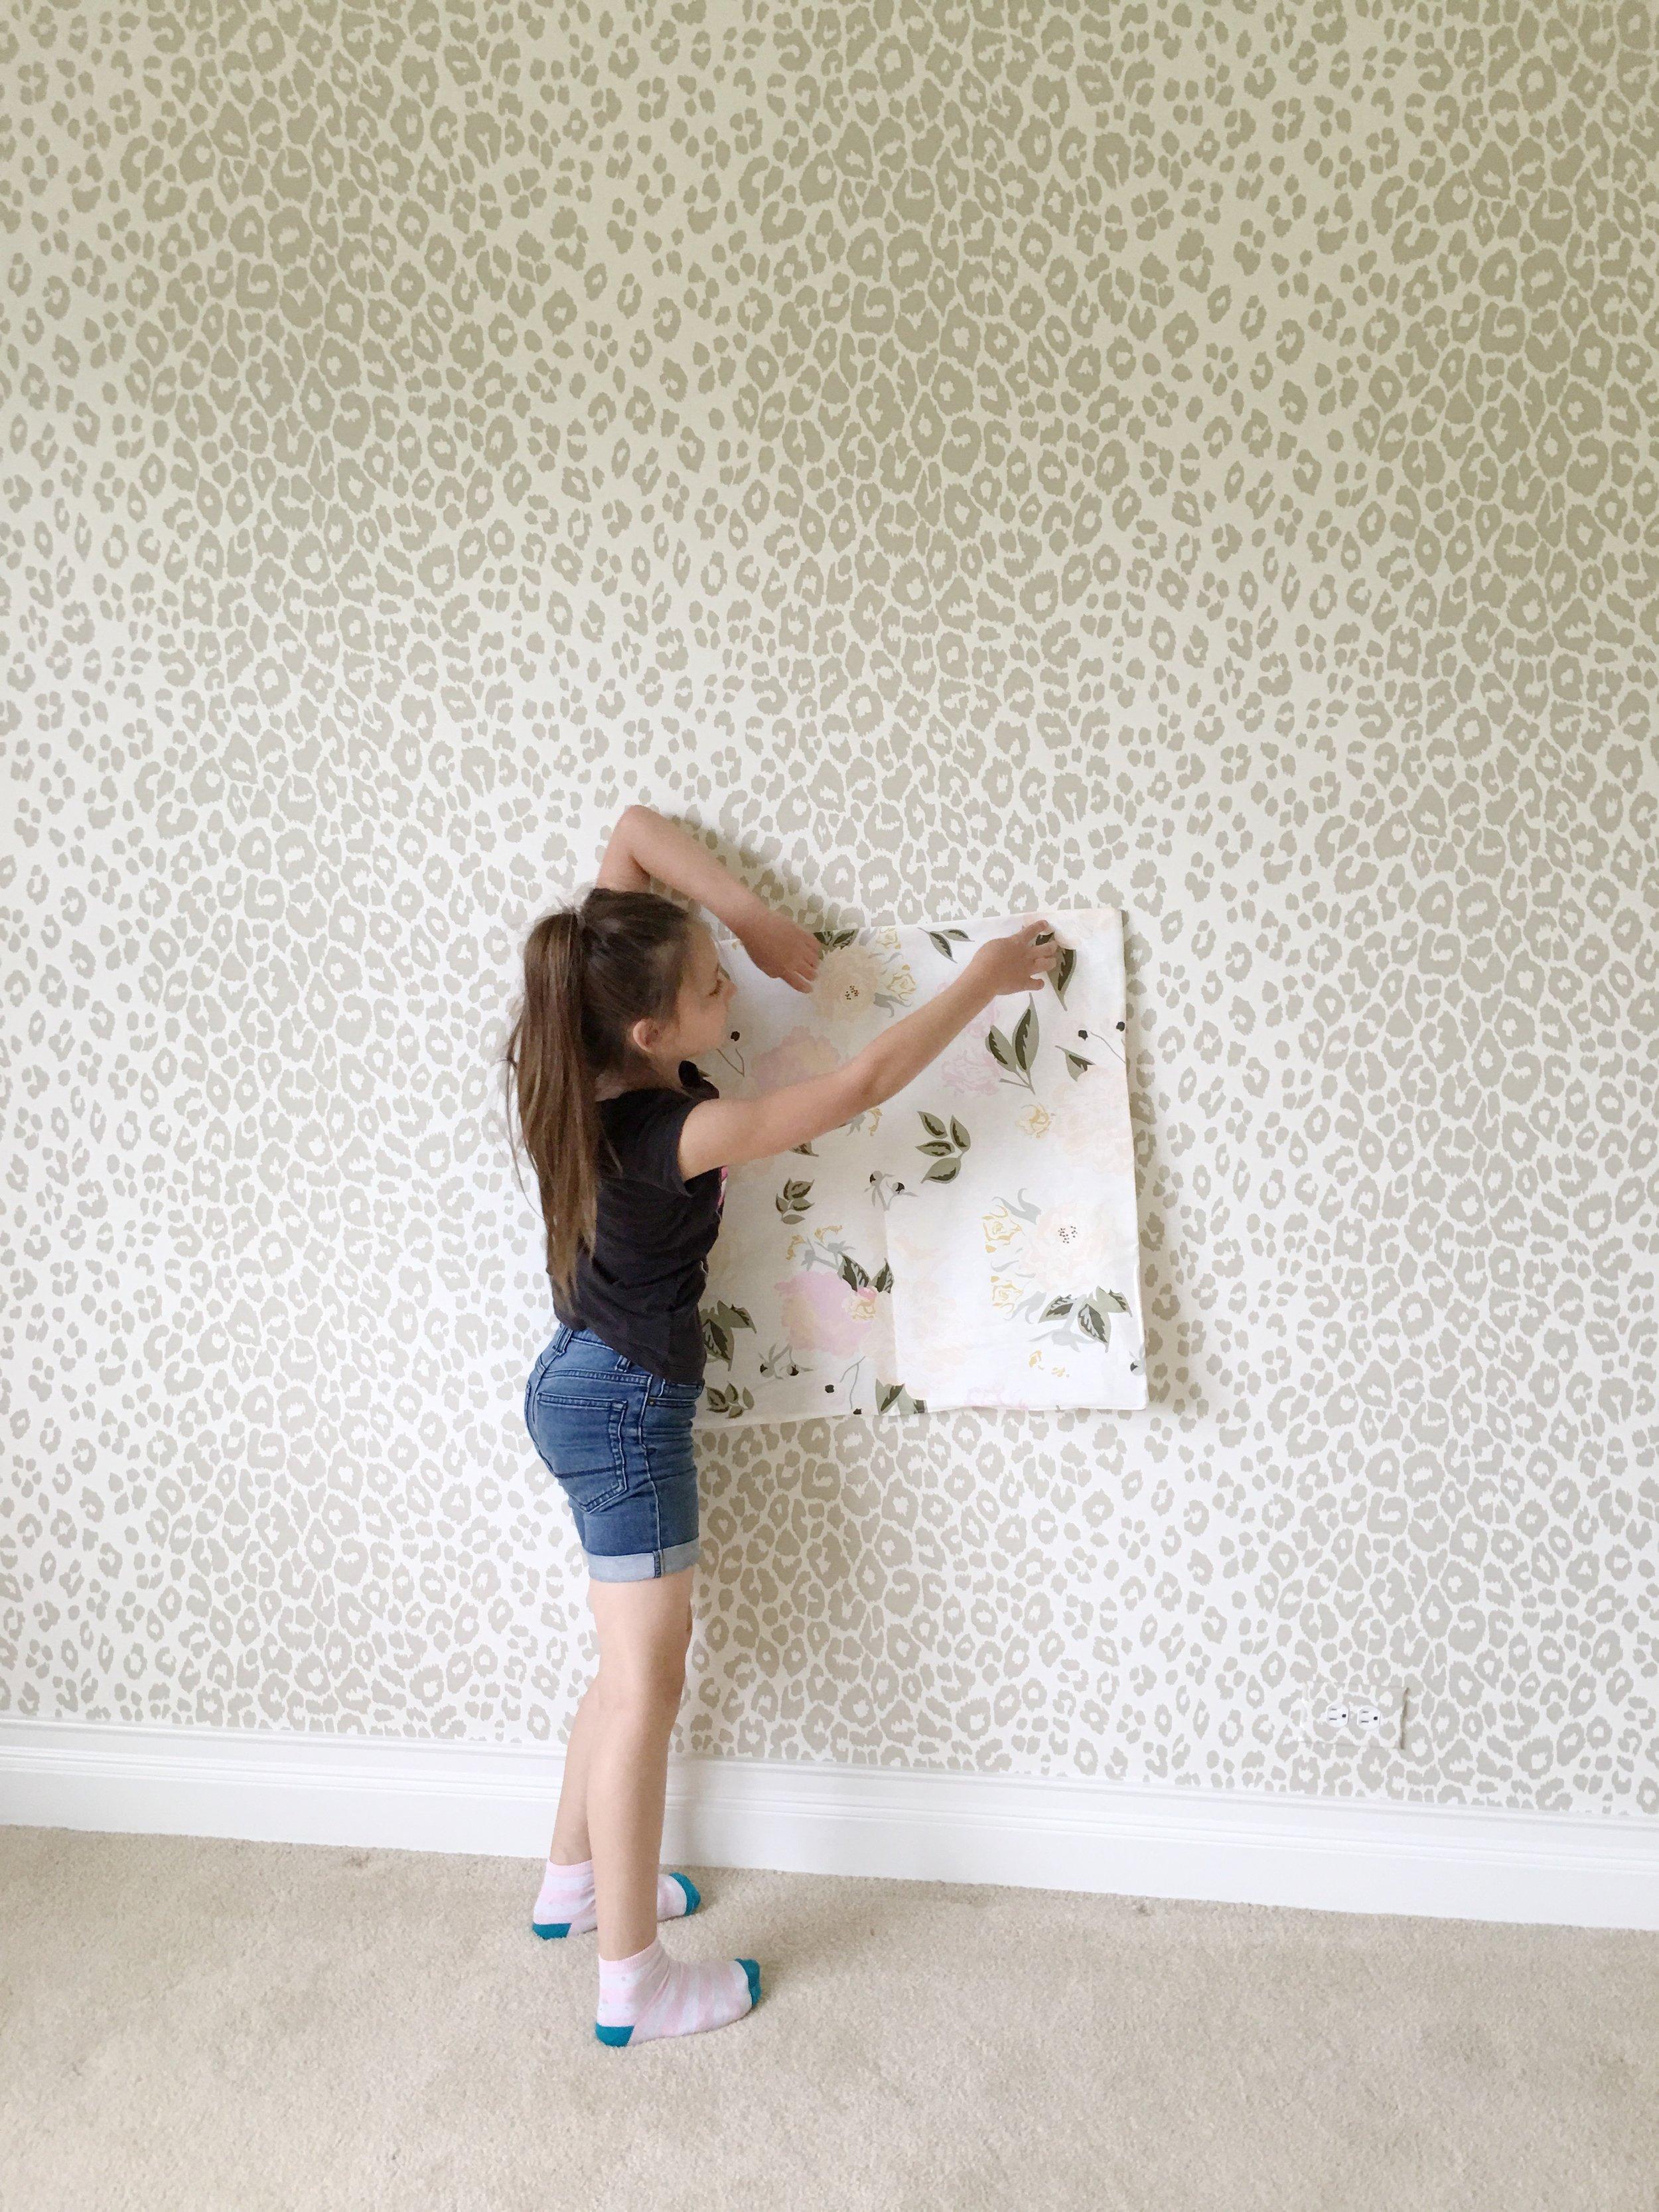 Schumacher Iconic Leopard Wallpaper - Laura Design Co.